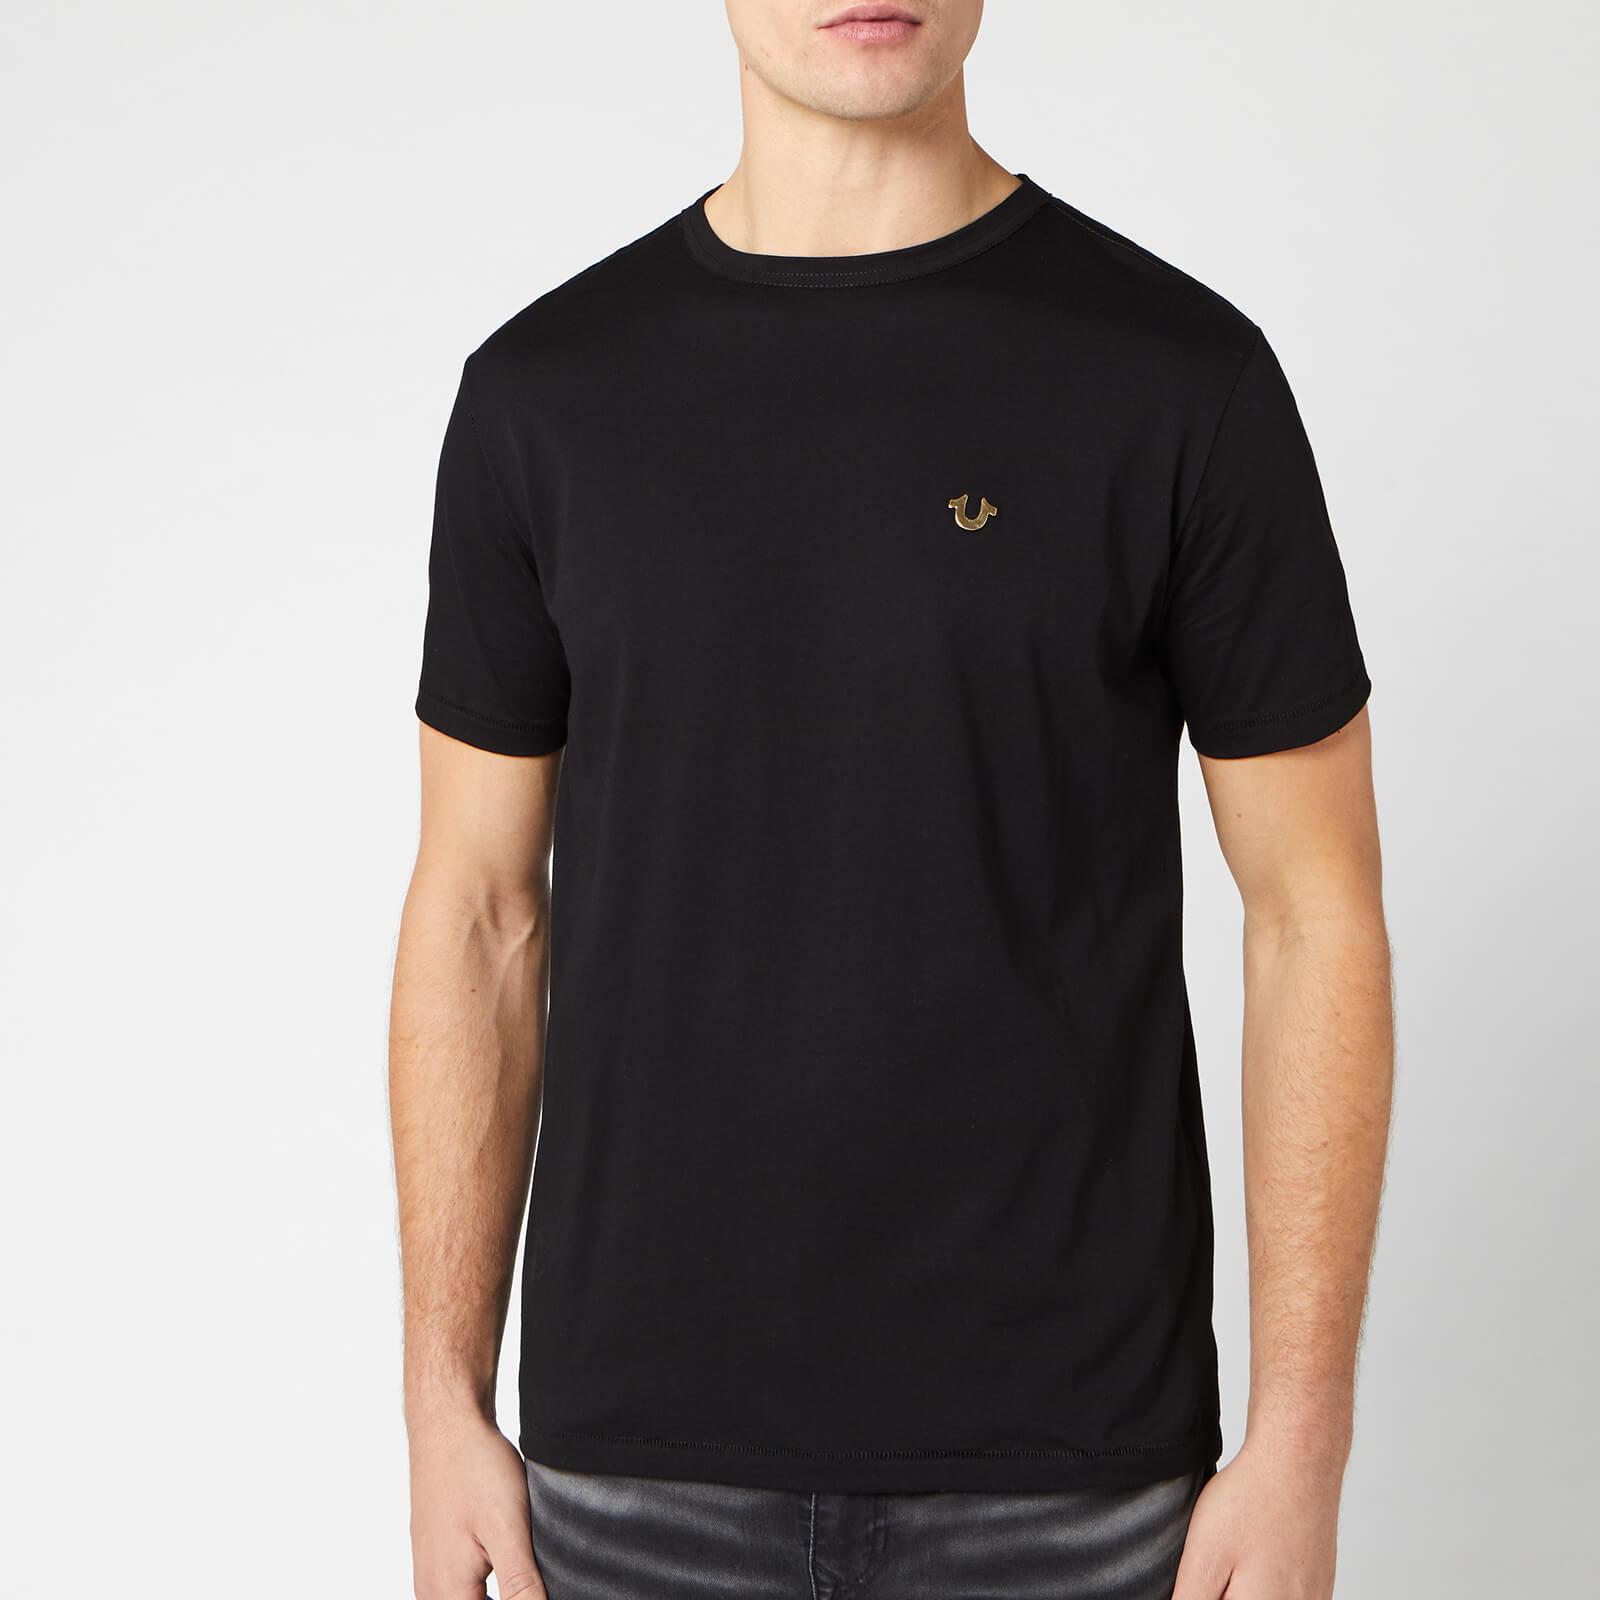 True Religion Men's Metal Horseshoe Crew T-Shirt - Black - M